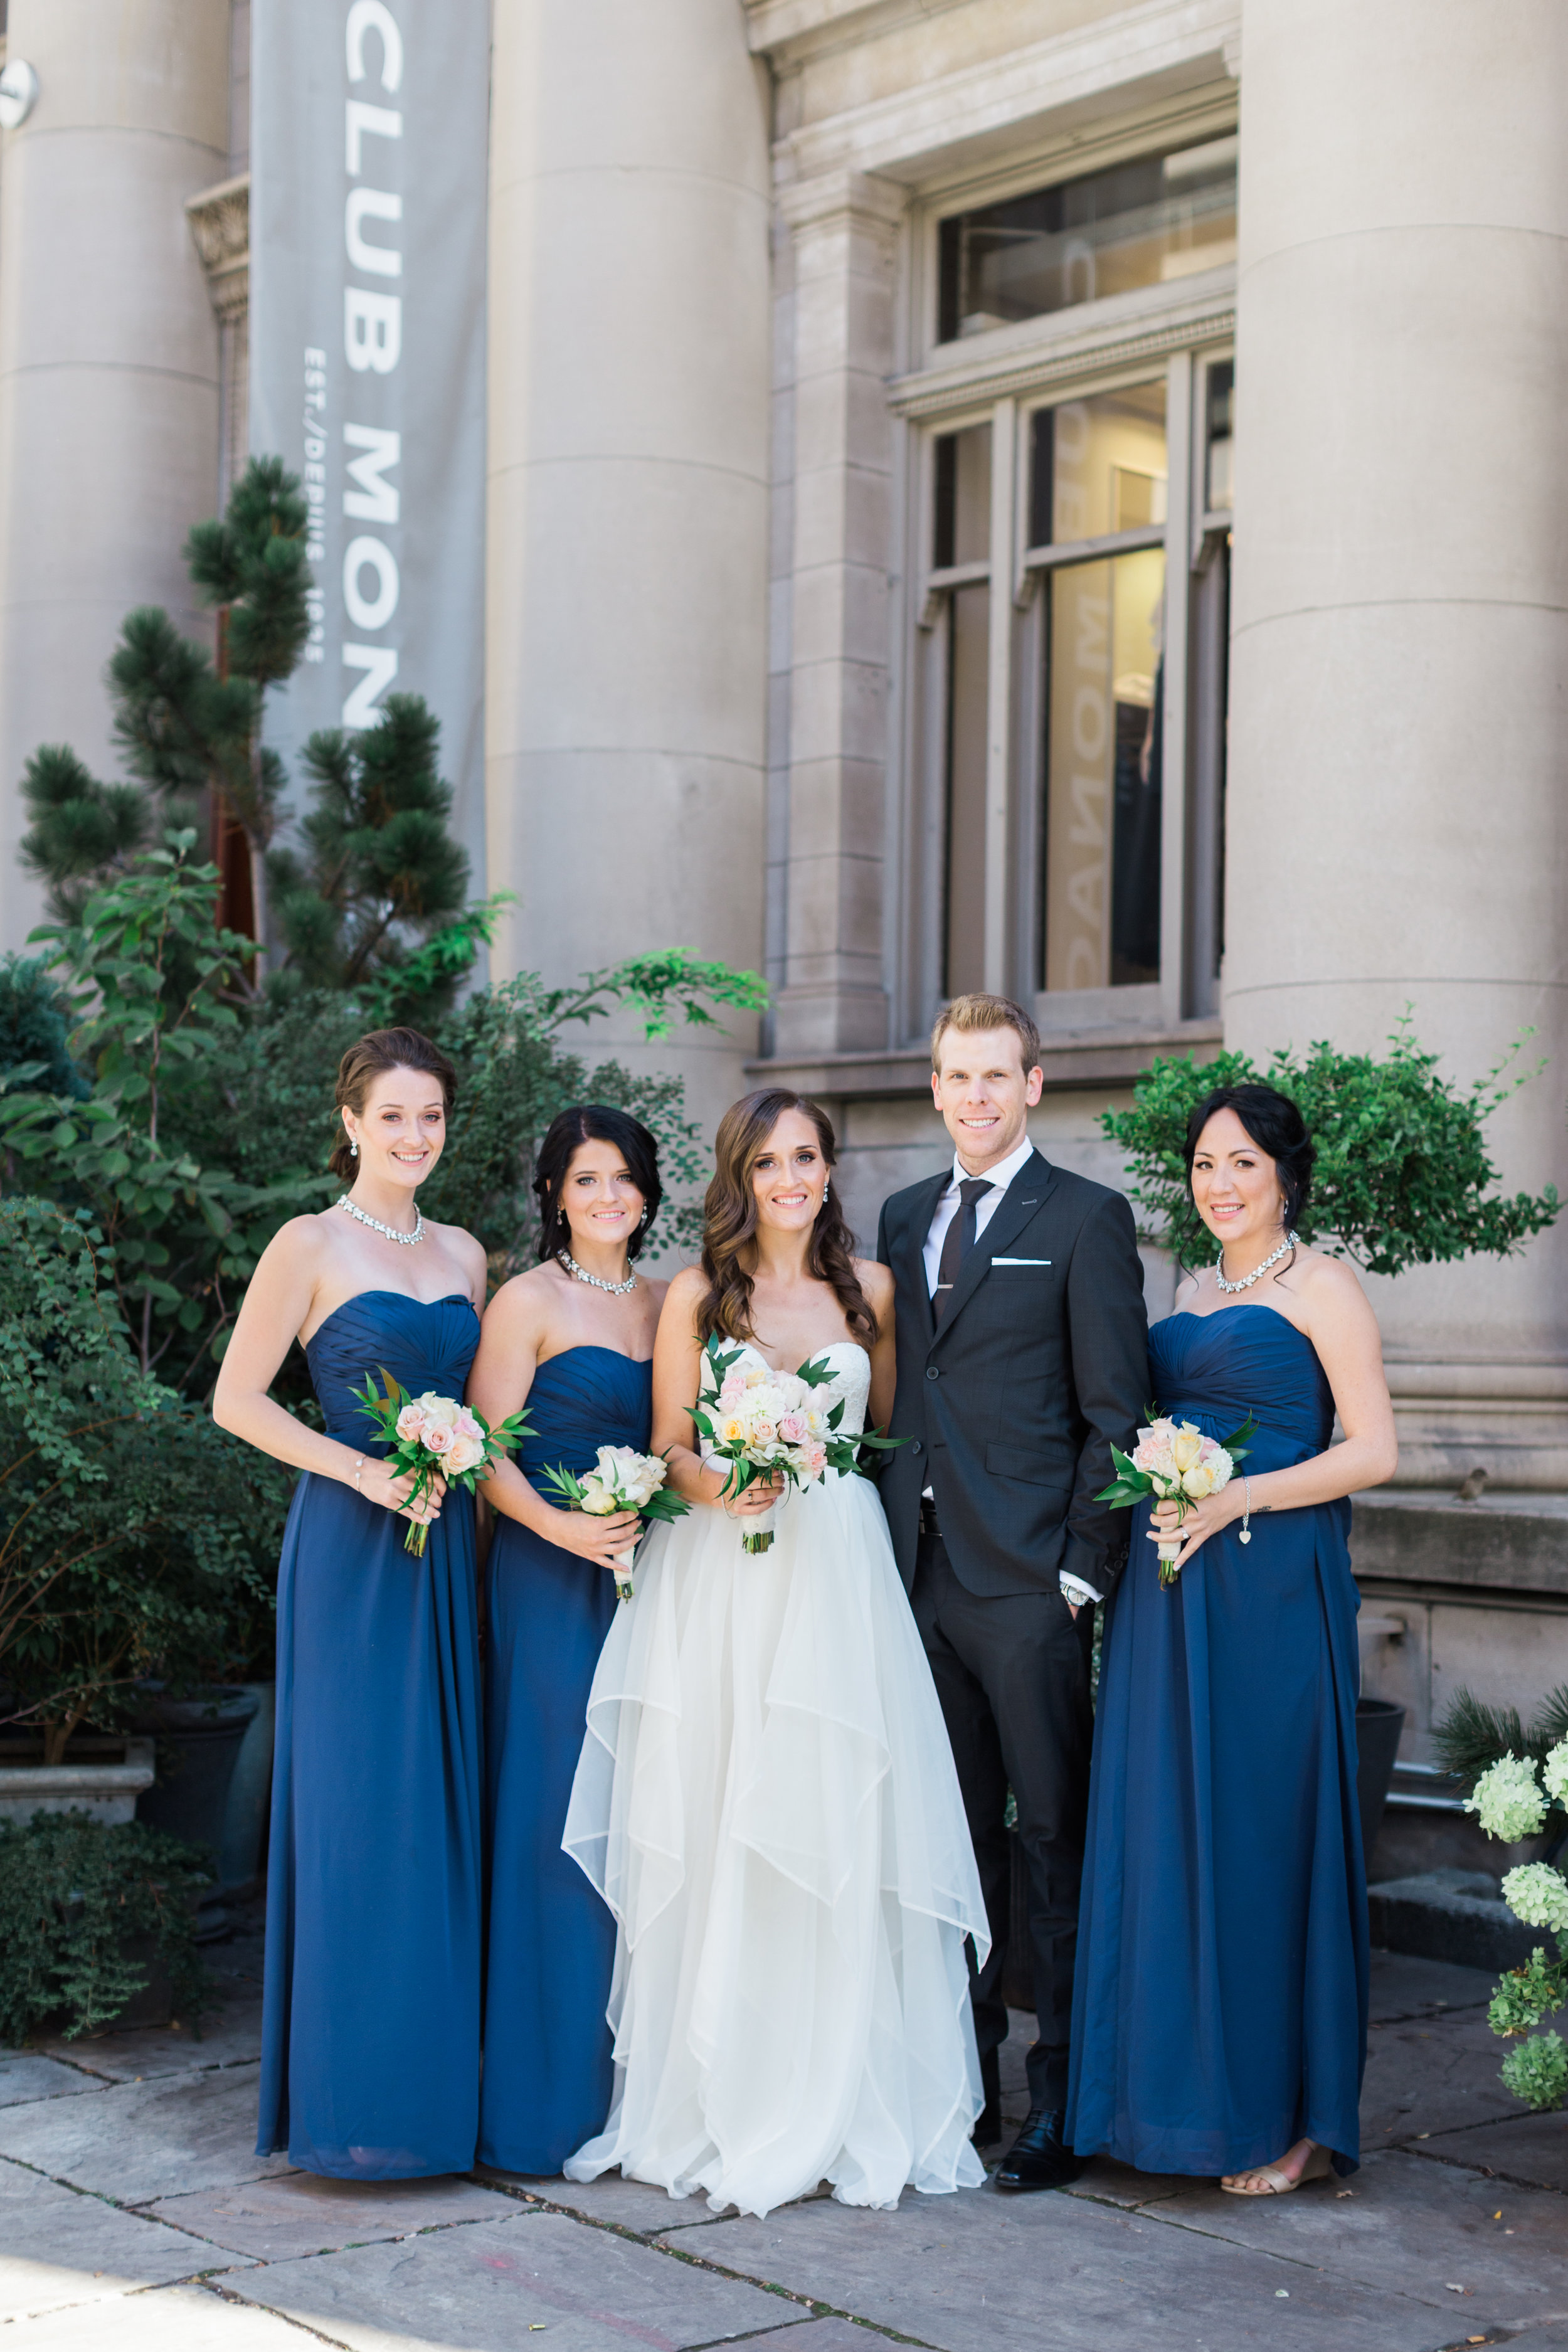 Toronto Fine Art Photographer - Yorkville Wedding - Bridal Party Portraits-46.jpg